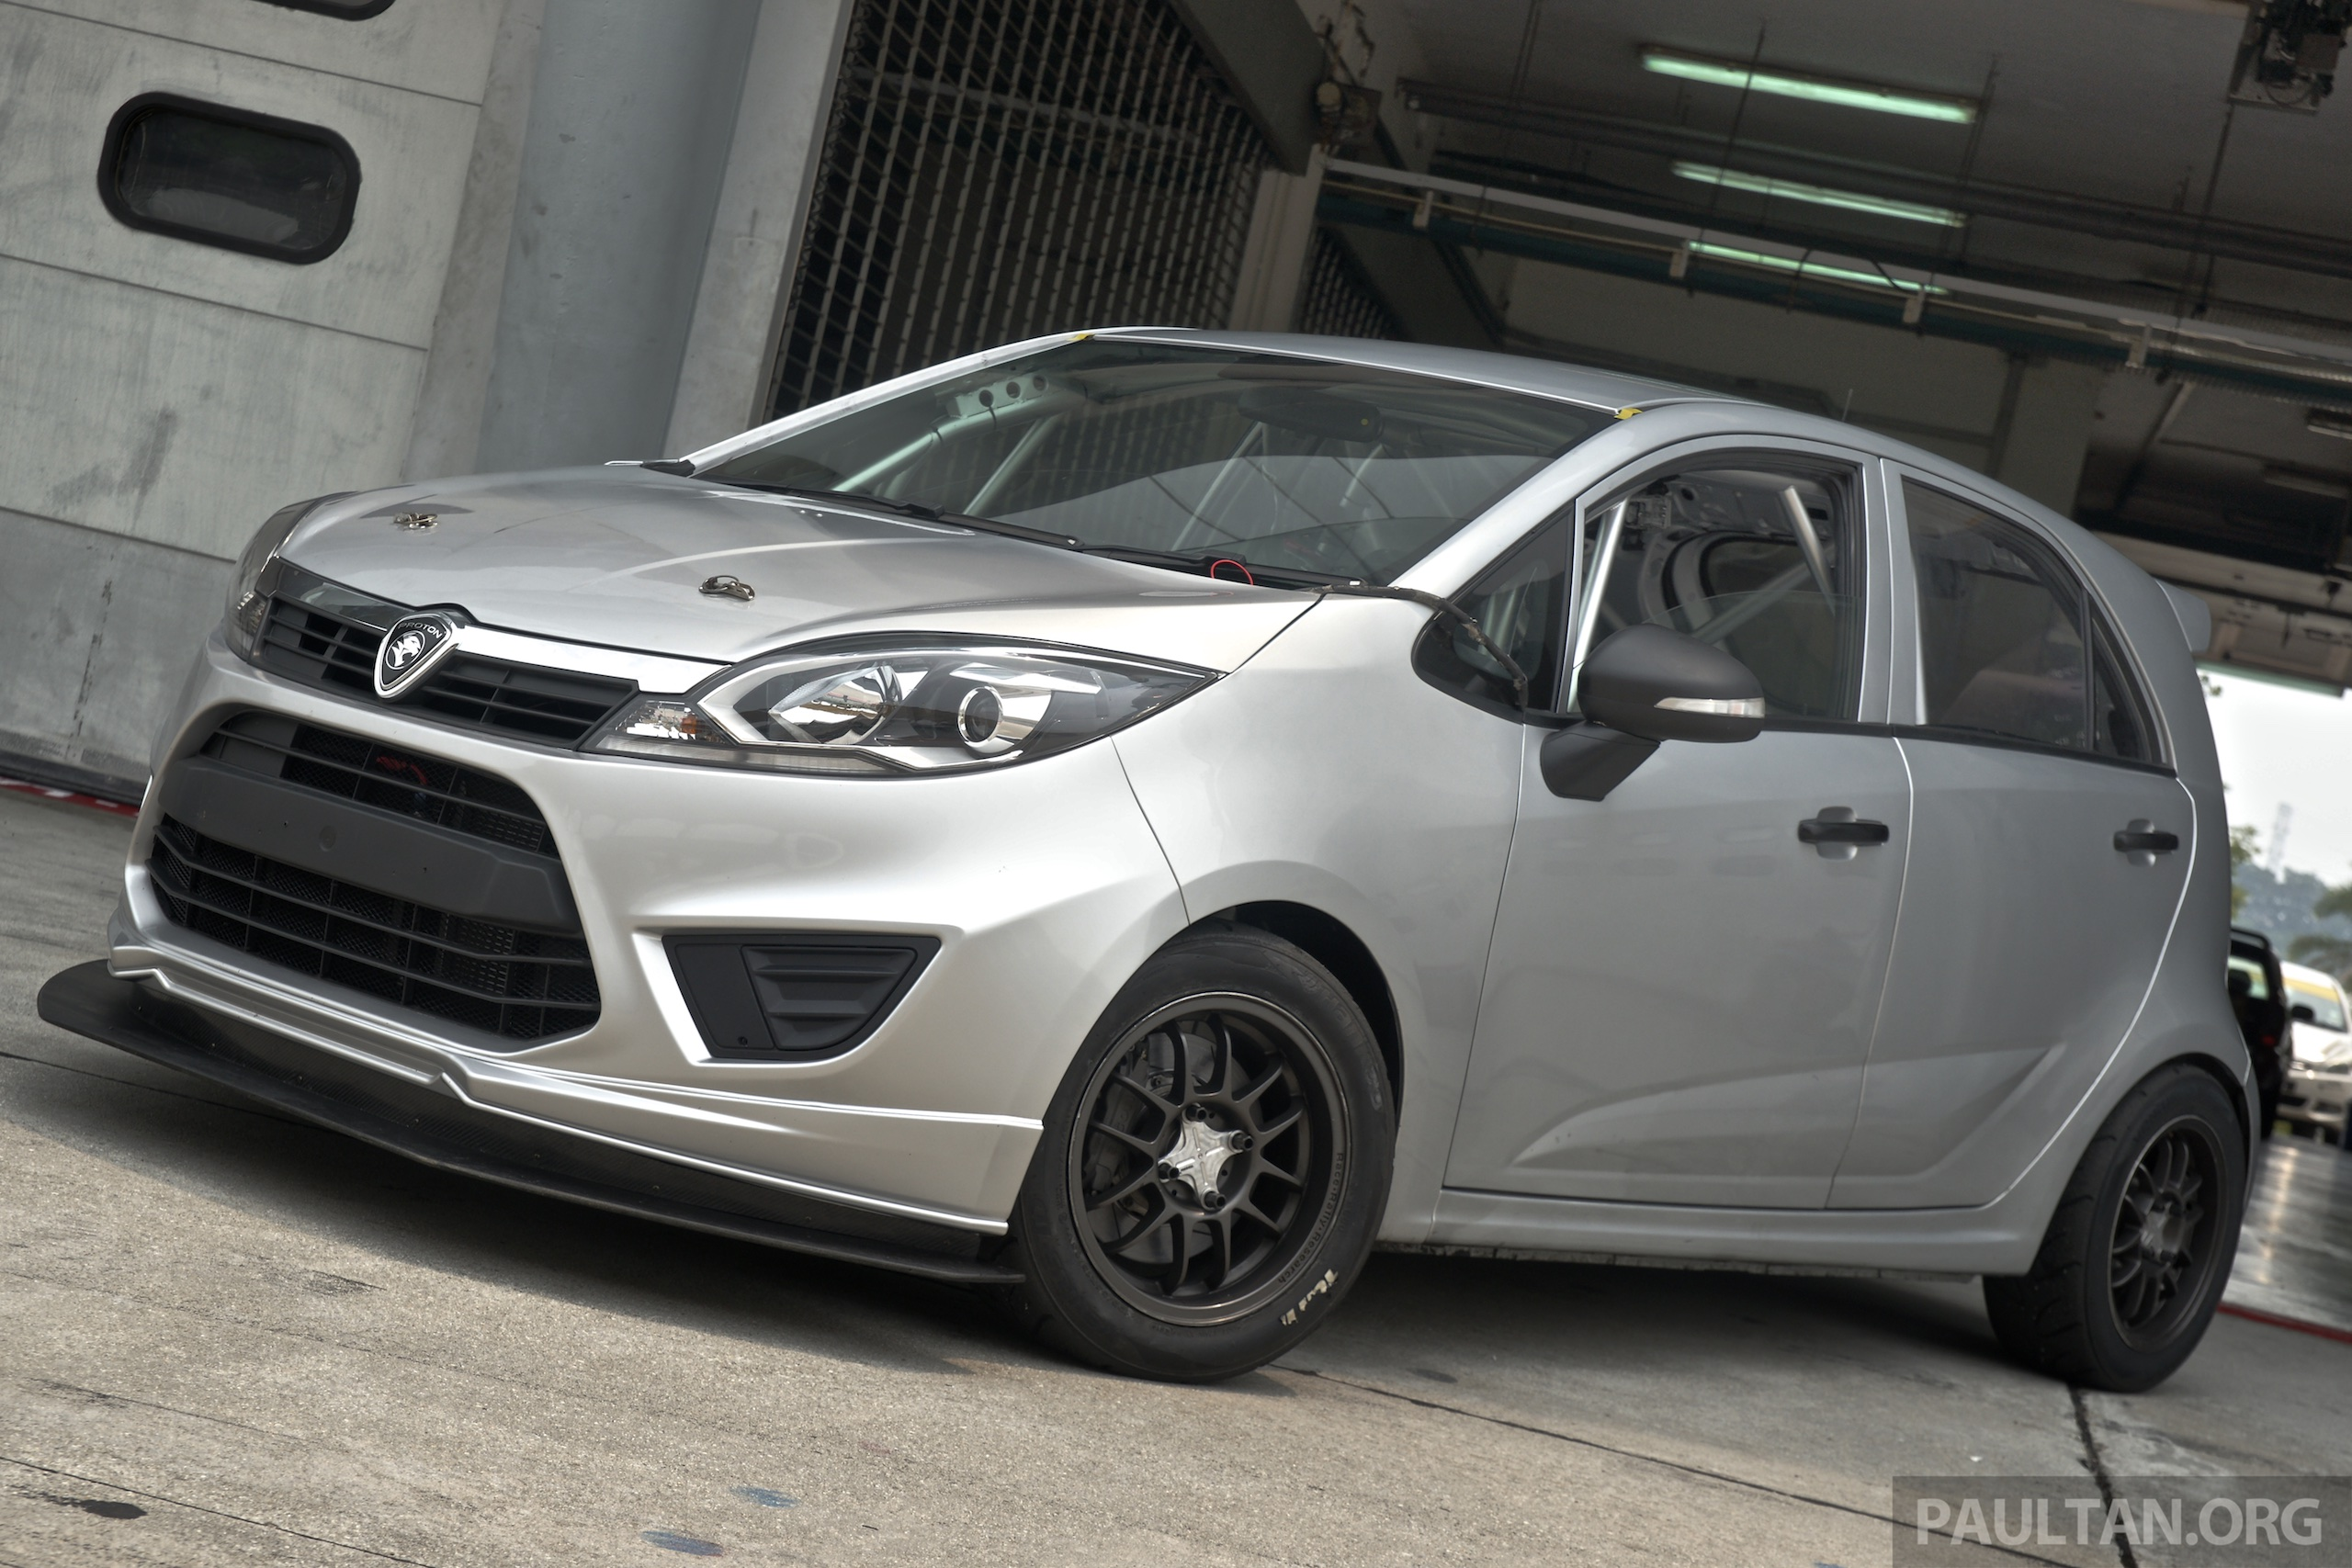 Malaysia Proton New Car